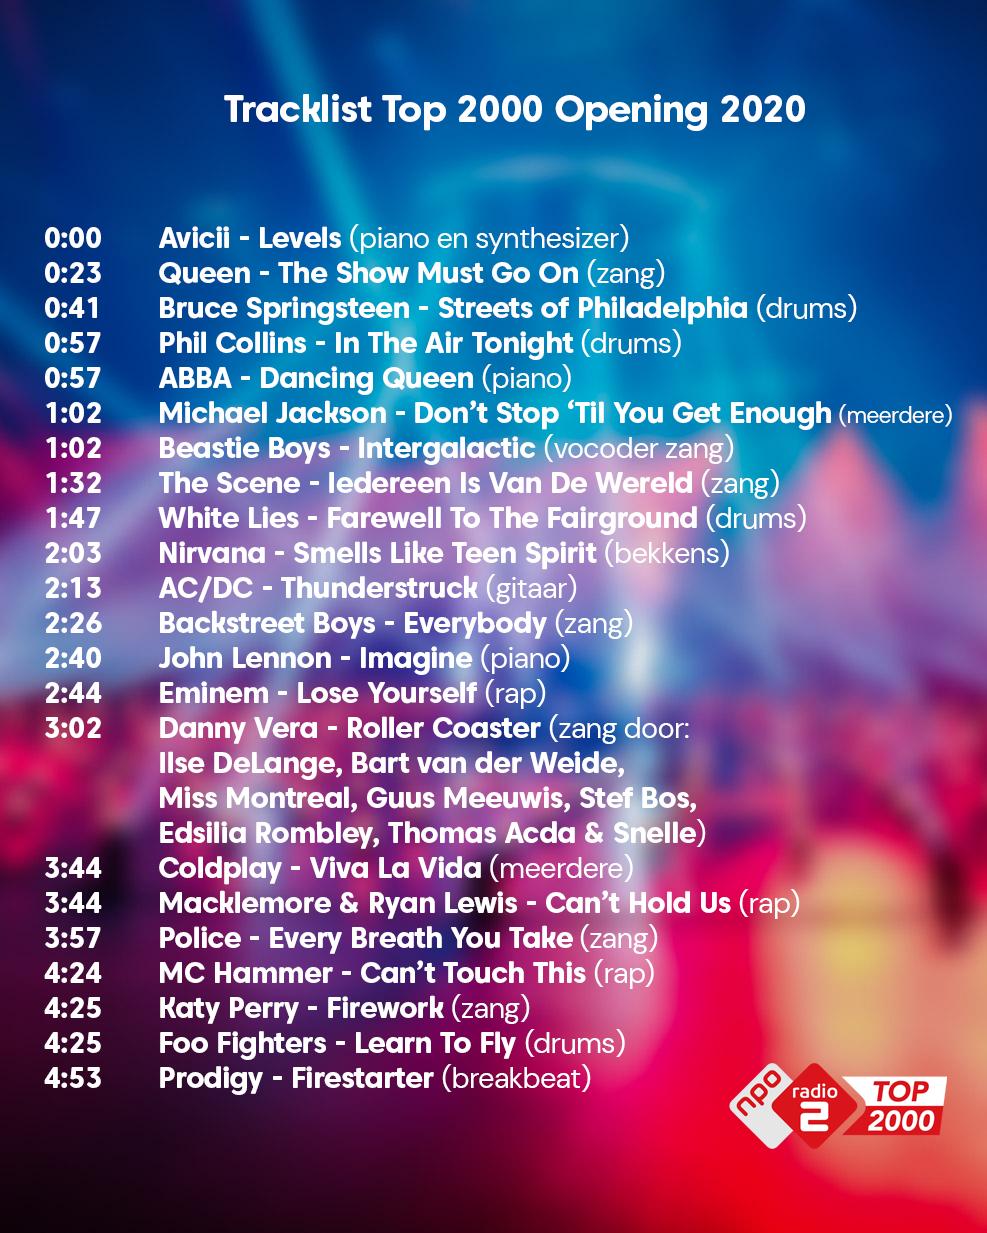 Tracklist openingdef2